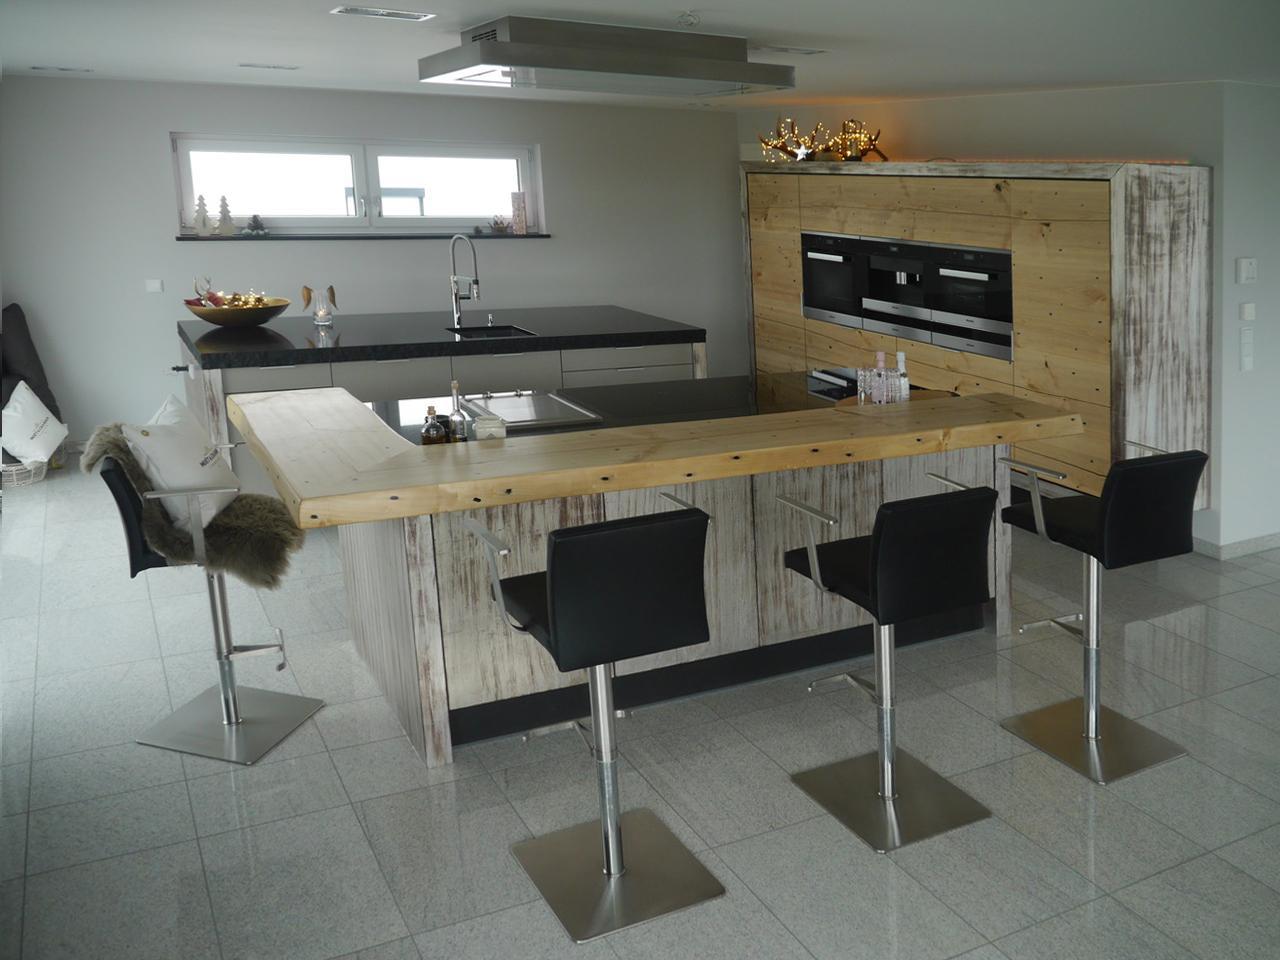 k che bilder ideen couchstyle. Black Bedroom Furniture Sets. Home Design Ideas